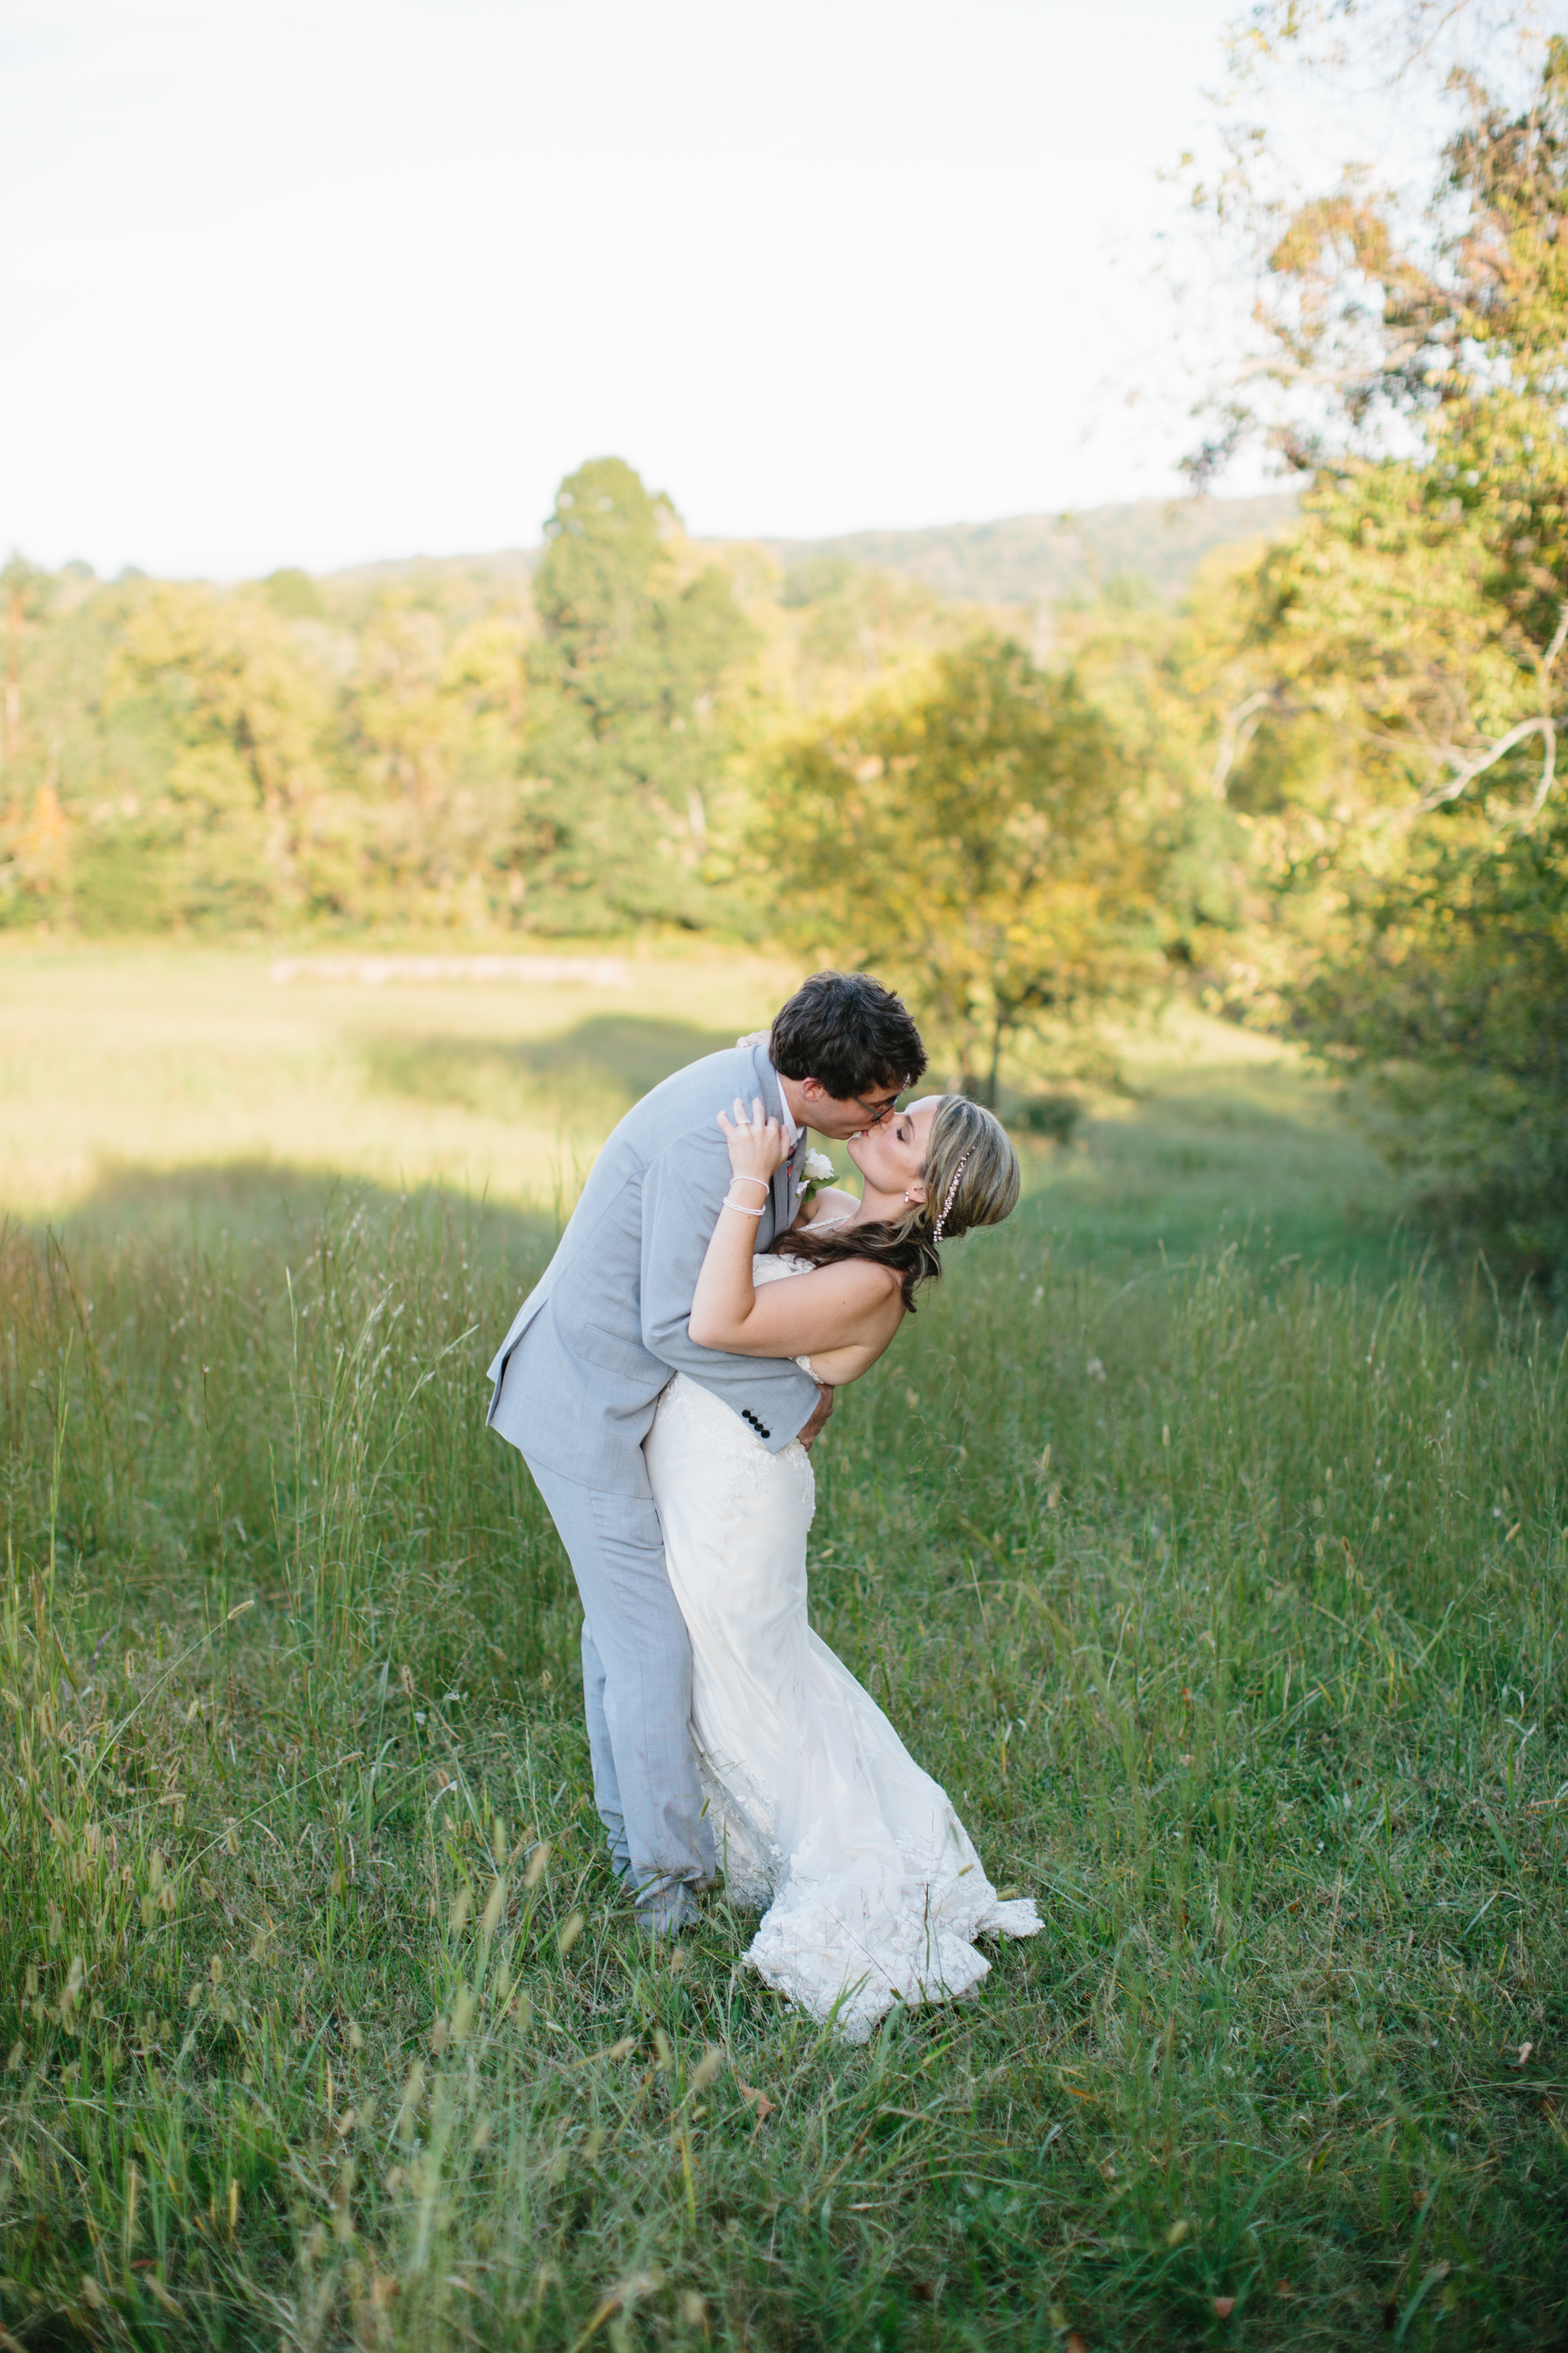 Abby_Simon_Wedding_Abigail_Malone_Photography_nashville_Bloomsbury_Farm-399.jpg